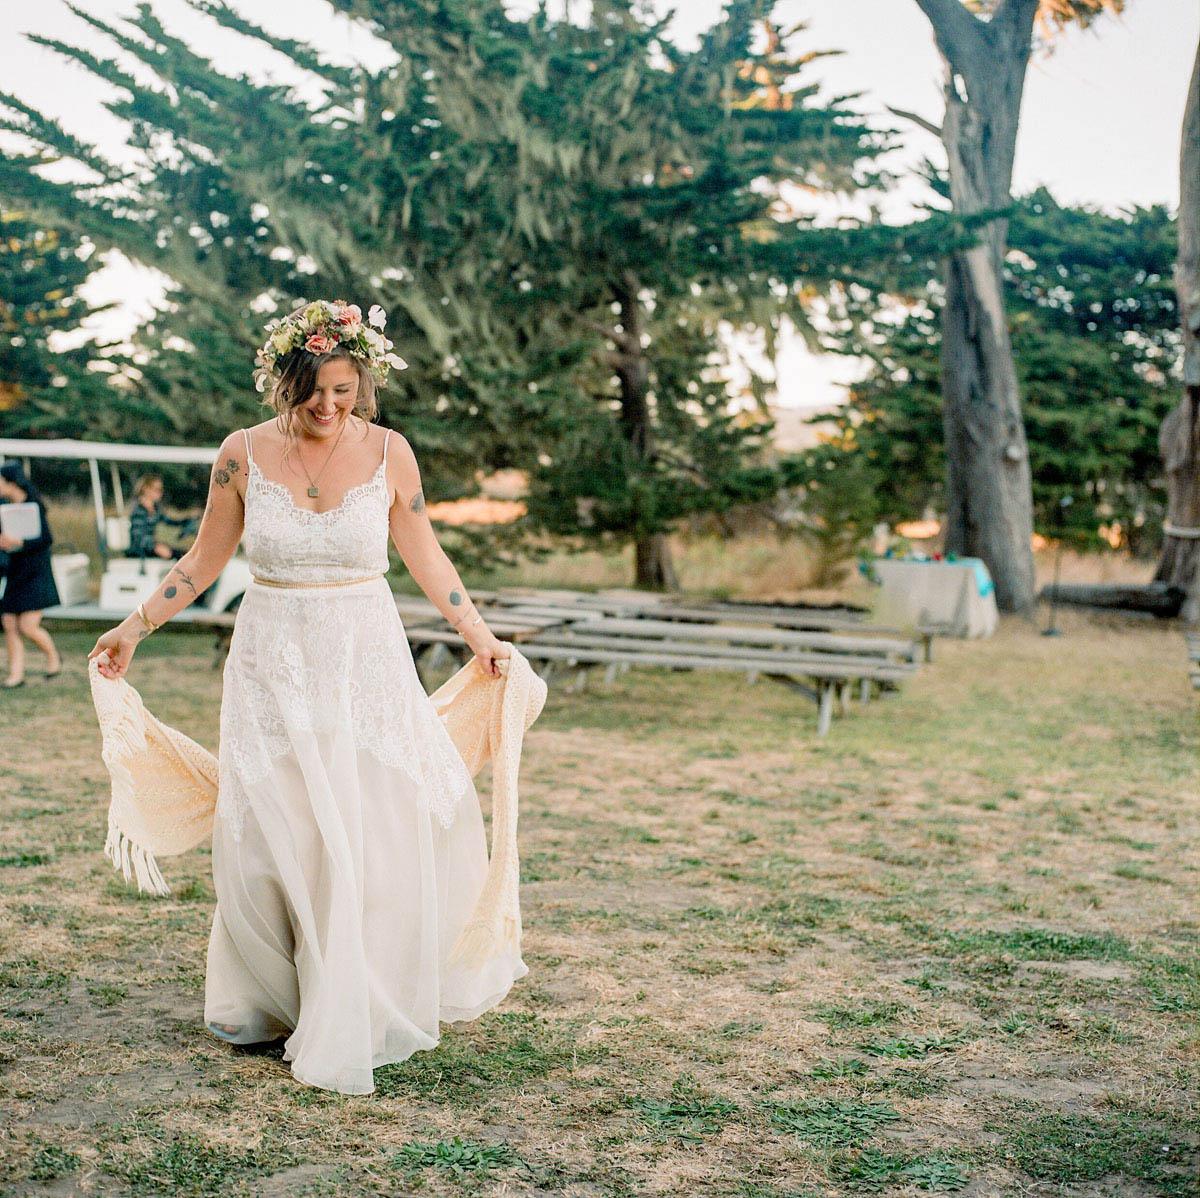 34-playful-bride-boho-wedding.jpg